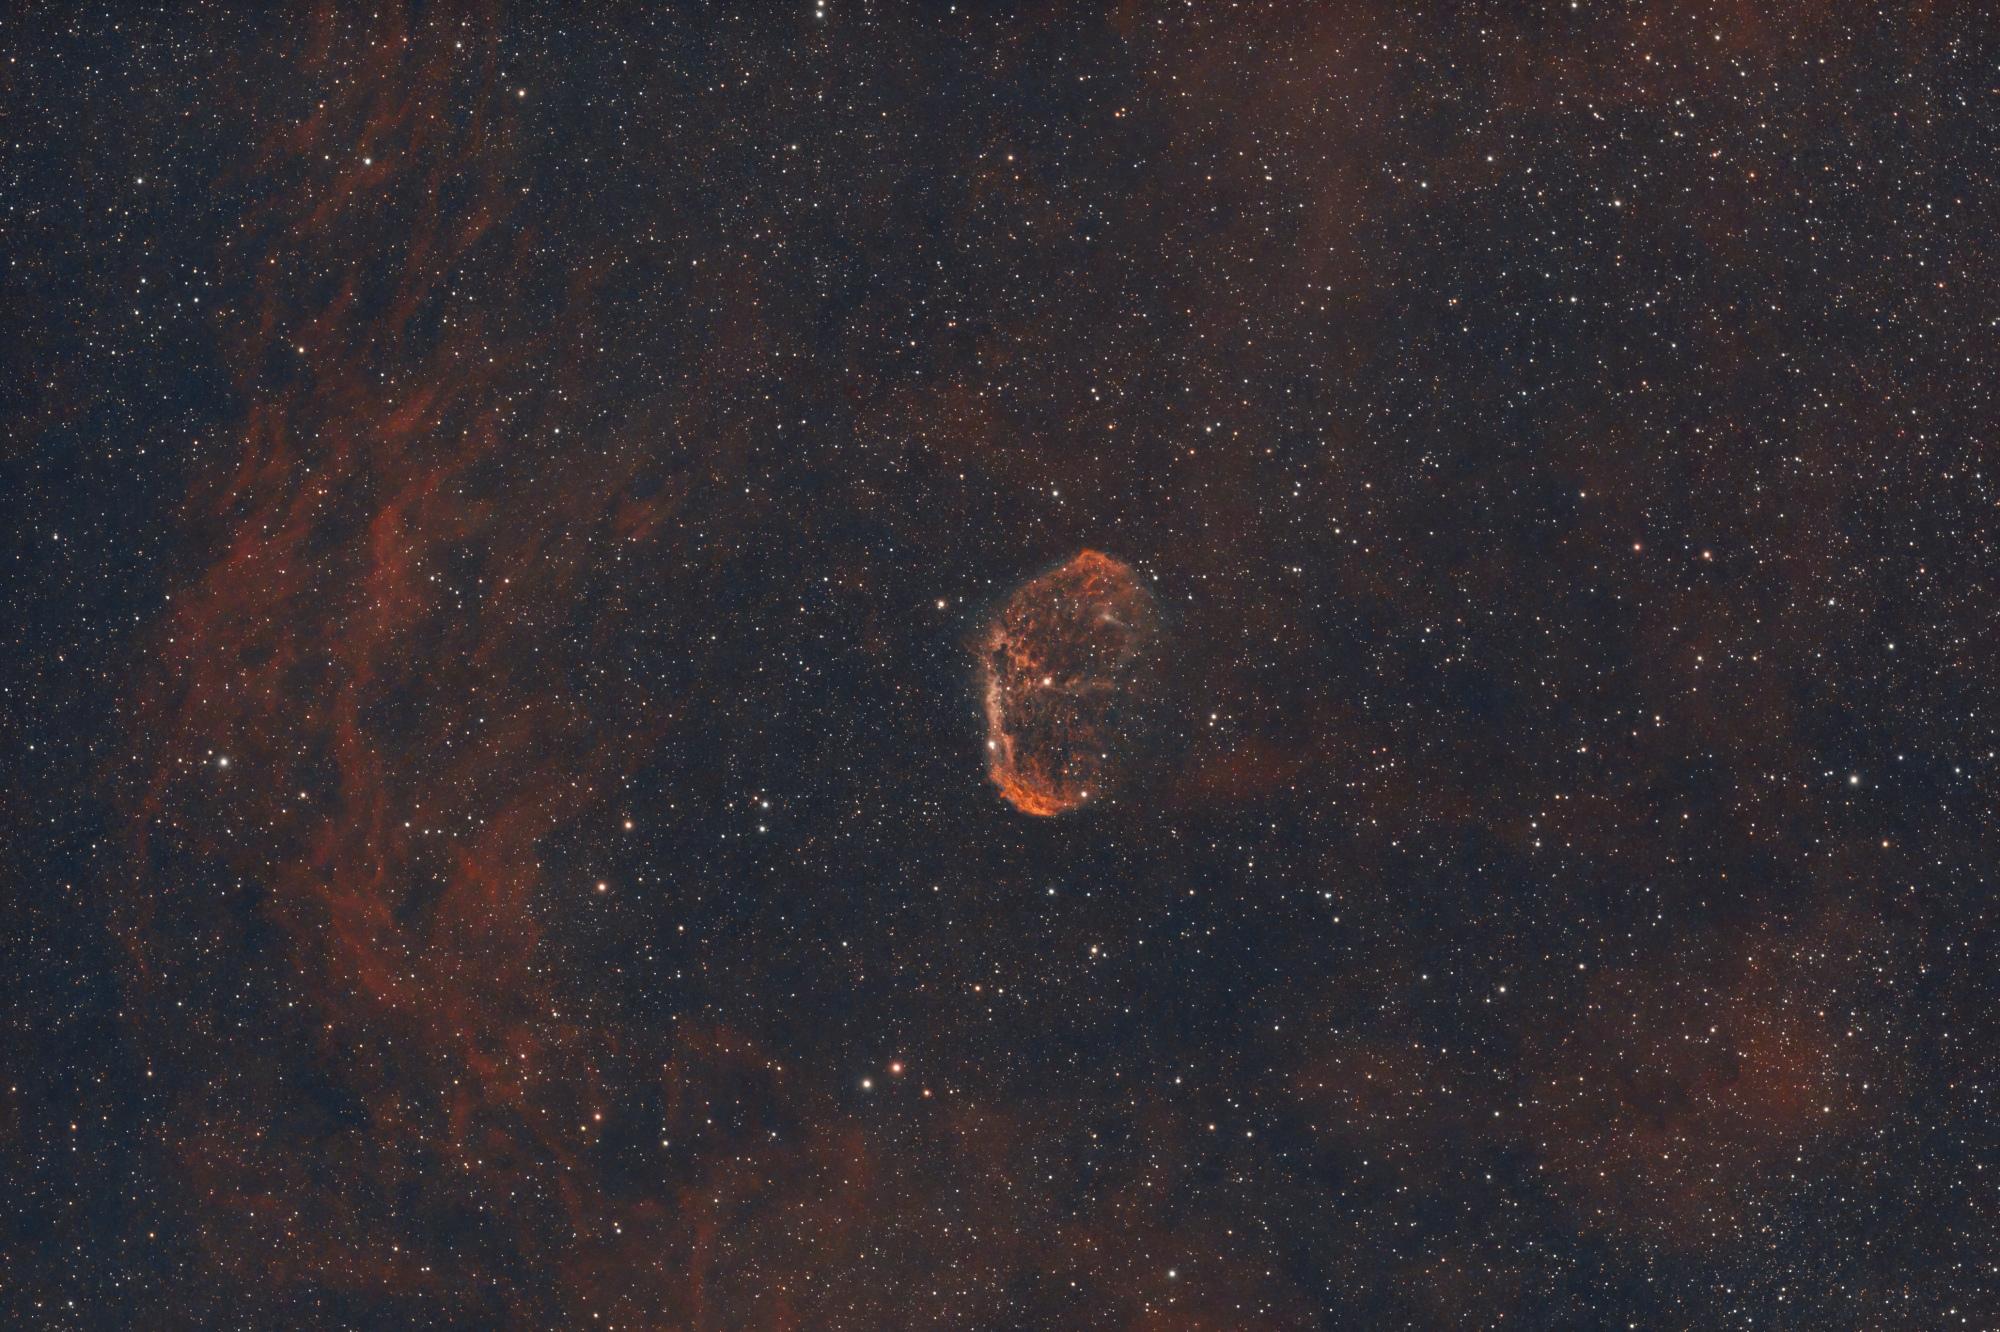 2021-09-16_NGC6888.jpg